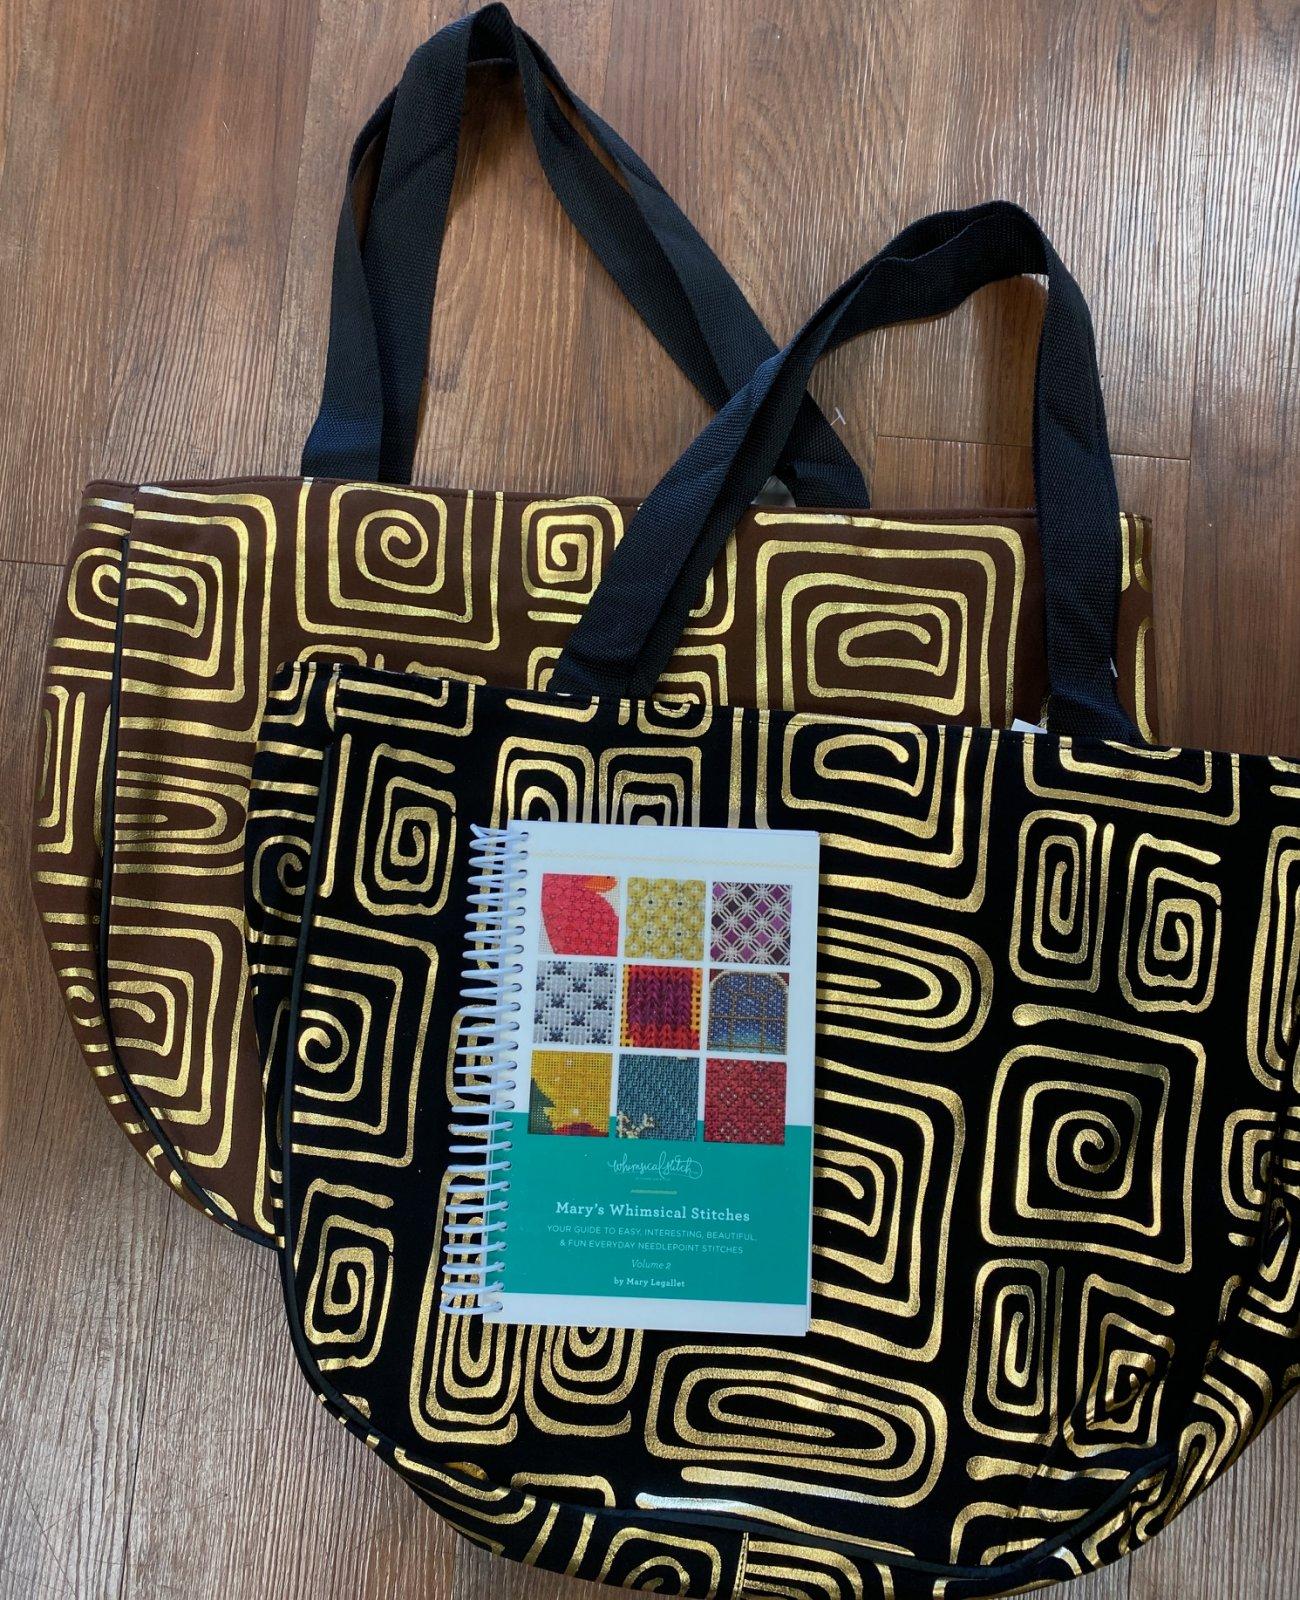 BONUS: Mary's Whimsical Stitches Book, Vol 2 w tote bag!